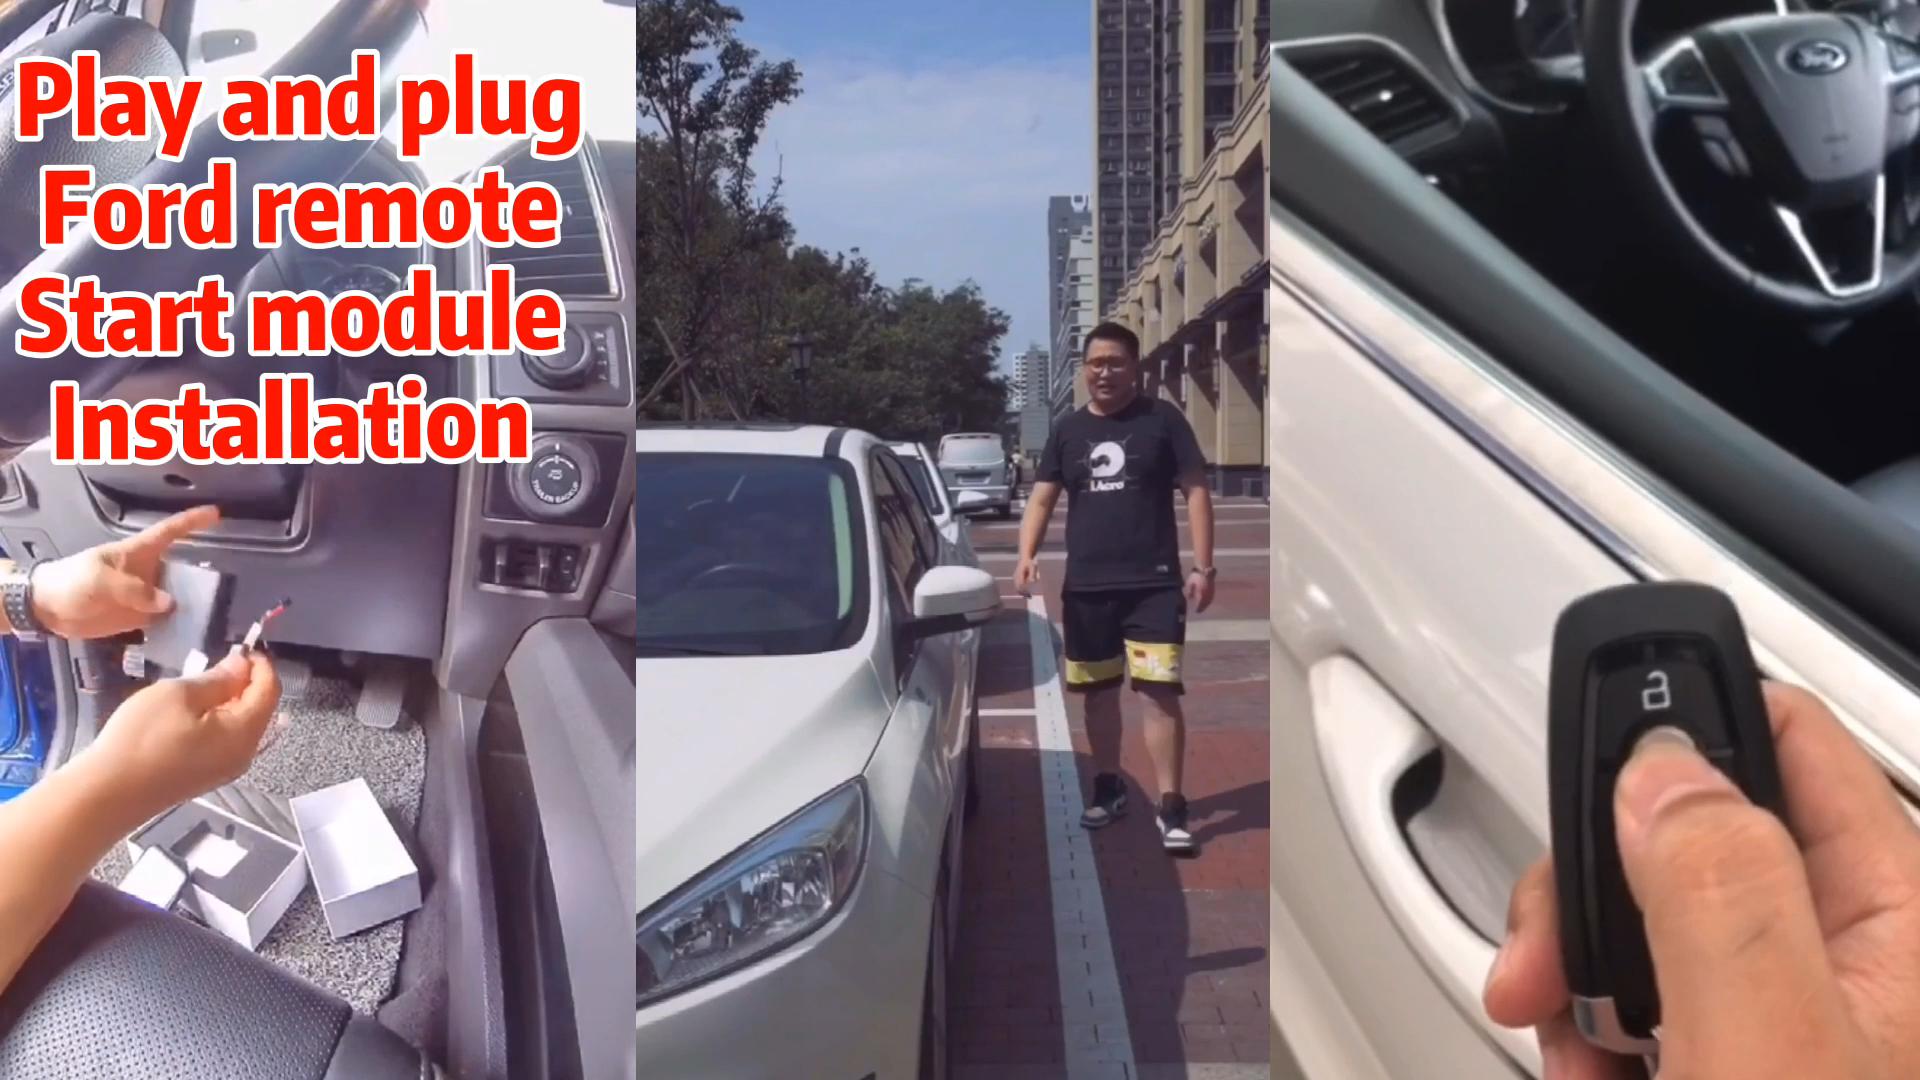 Start stop keyless entry inteligente Cardot carro original remoto diy início plug & play canbus para ford